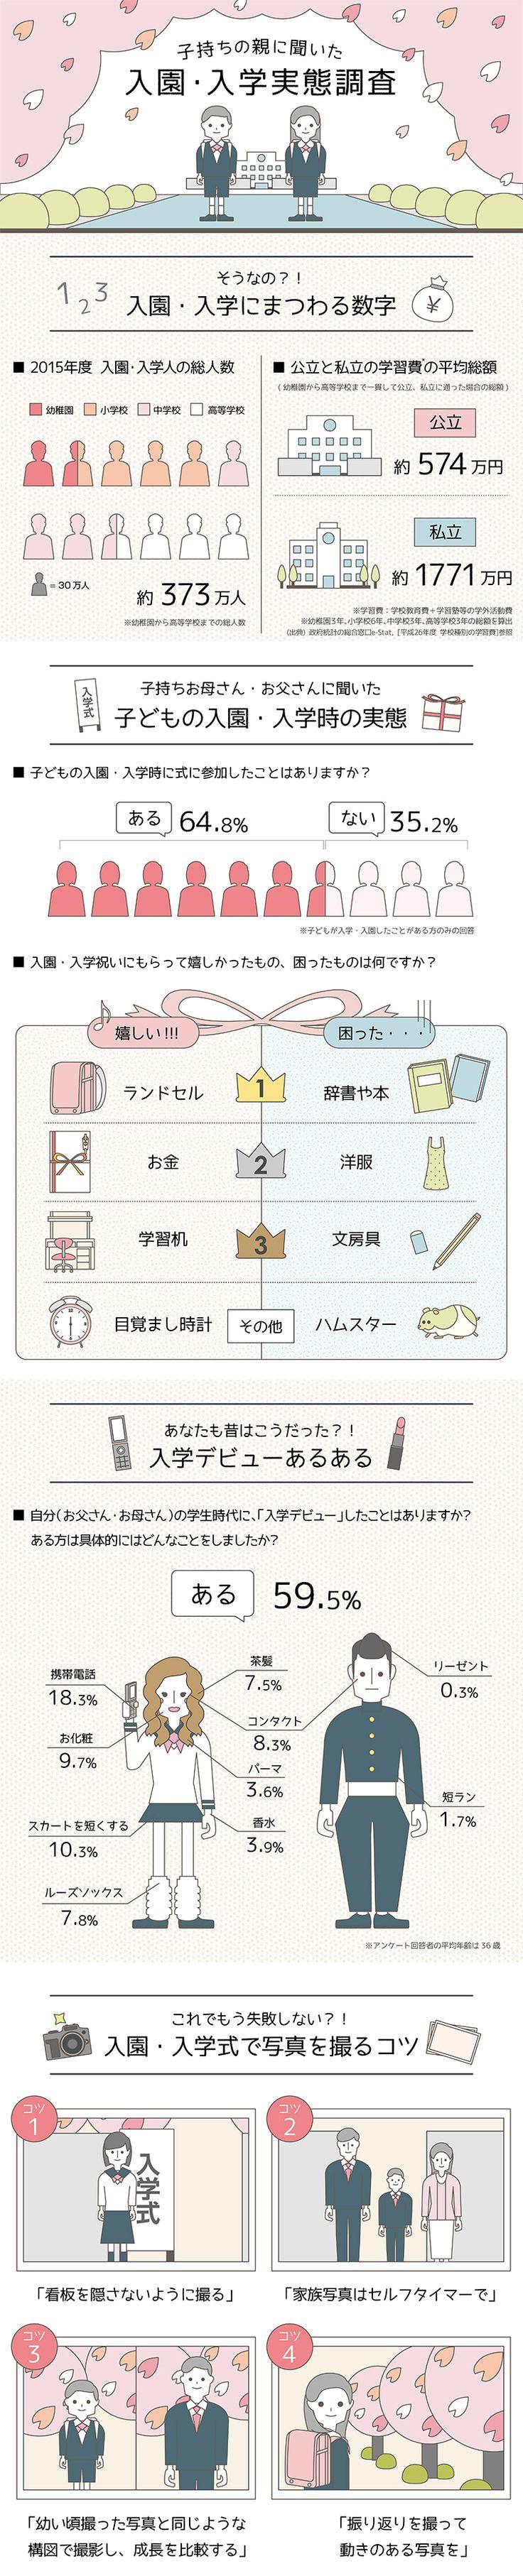 www.asukanet.co.jp main photo images infog 13 nyugaku.jpg